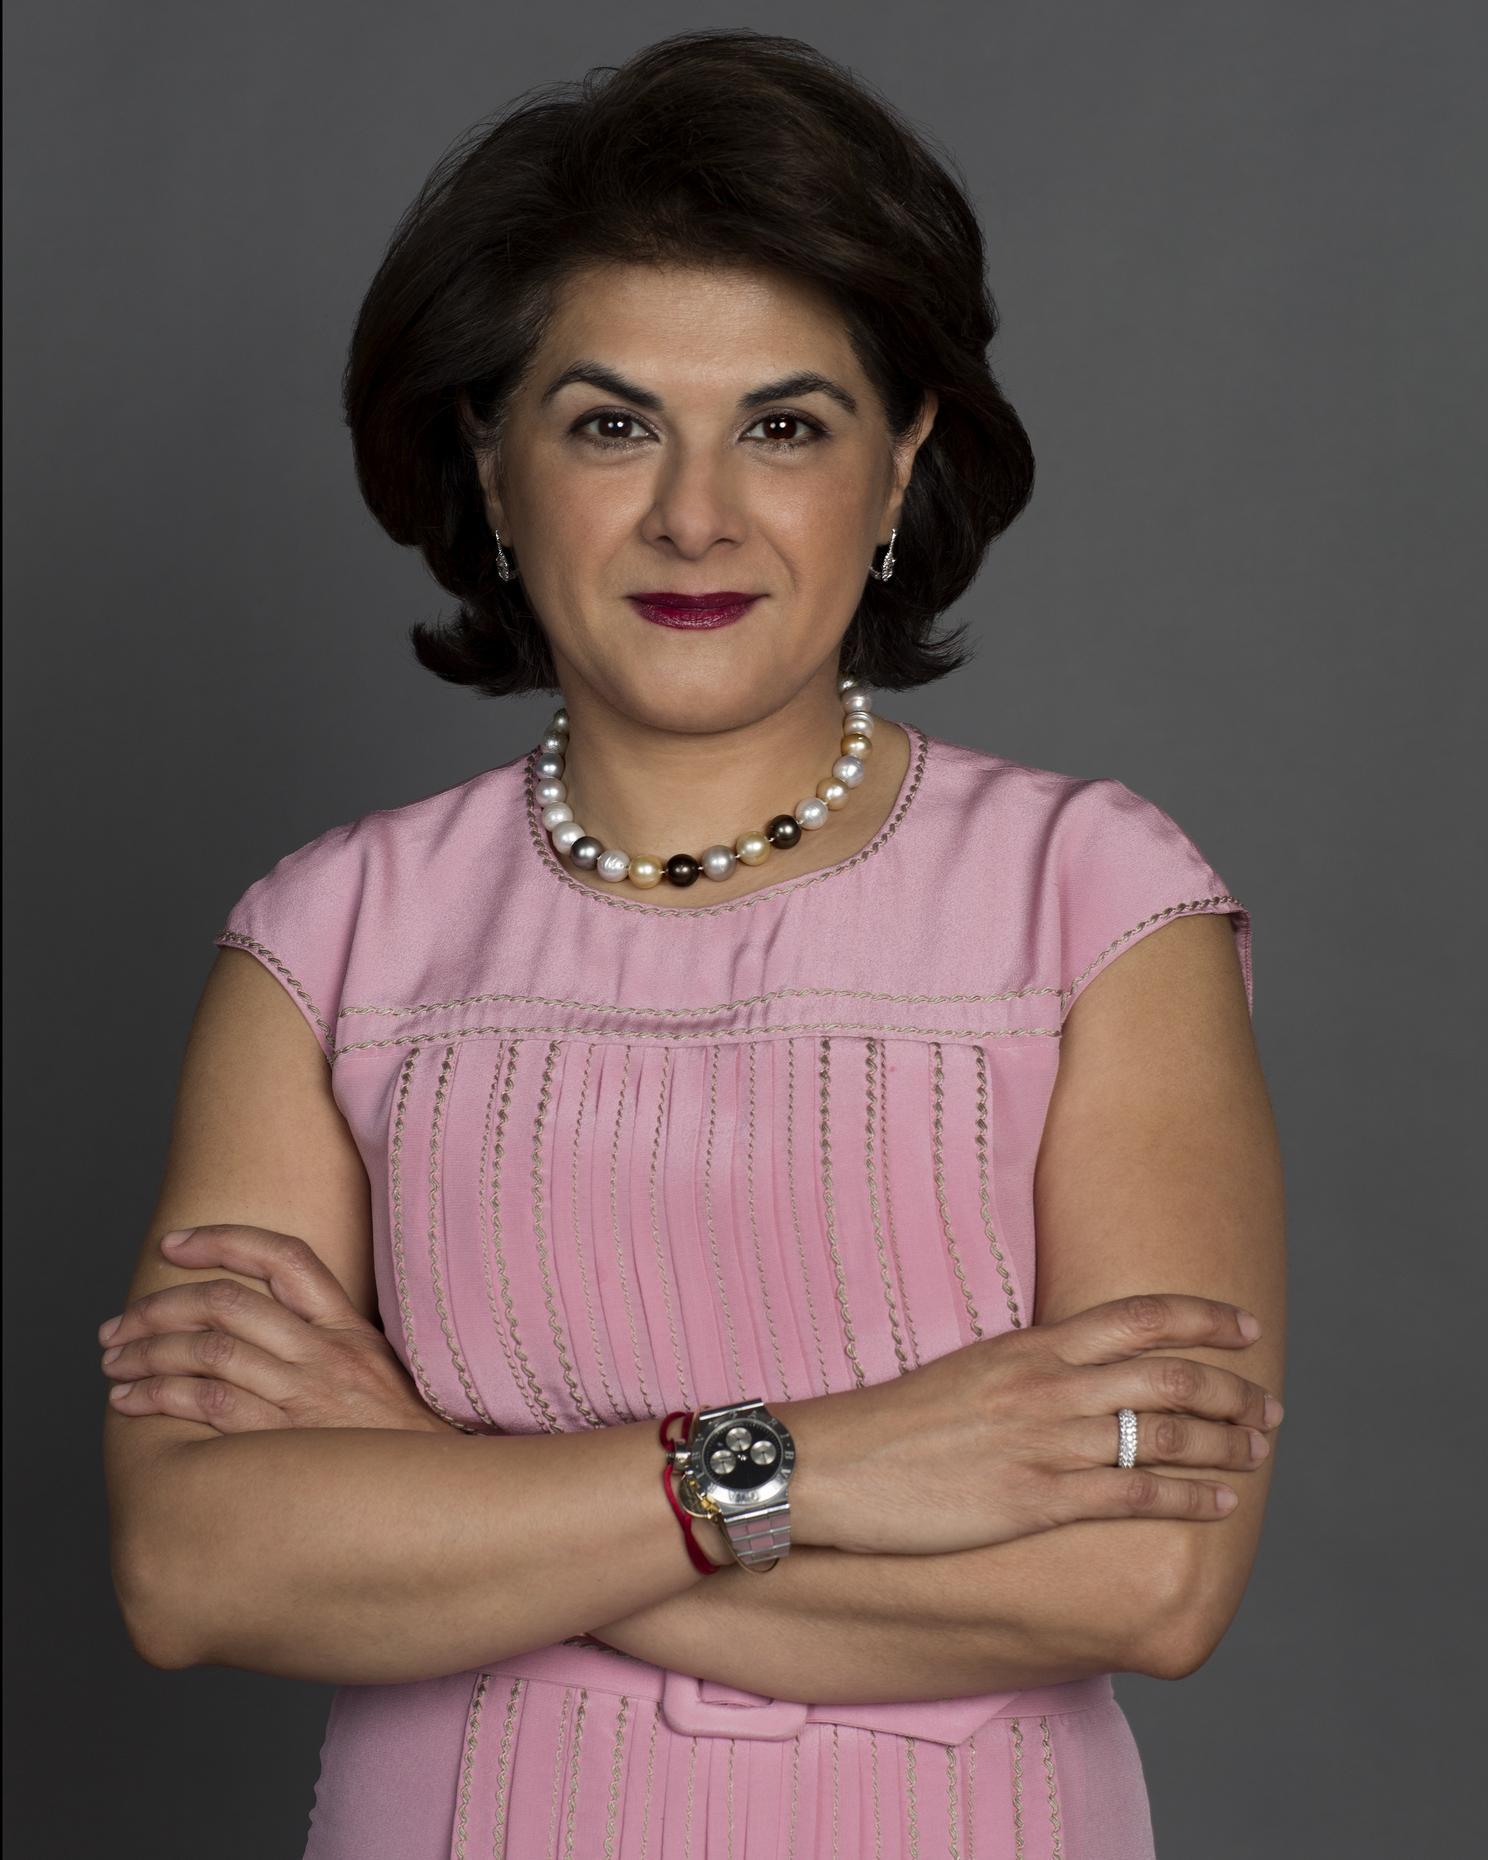 Goli Sheikholeslami